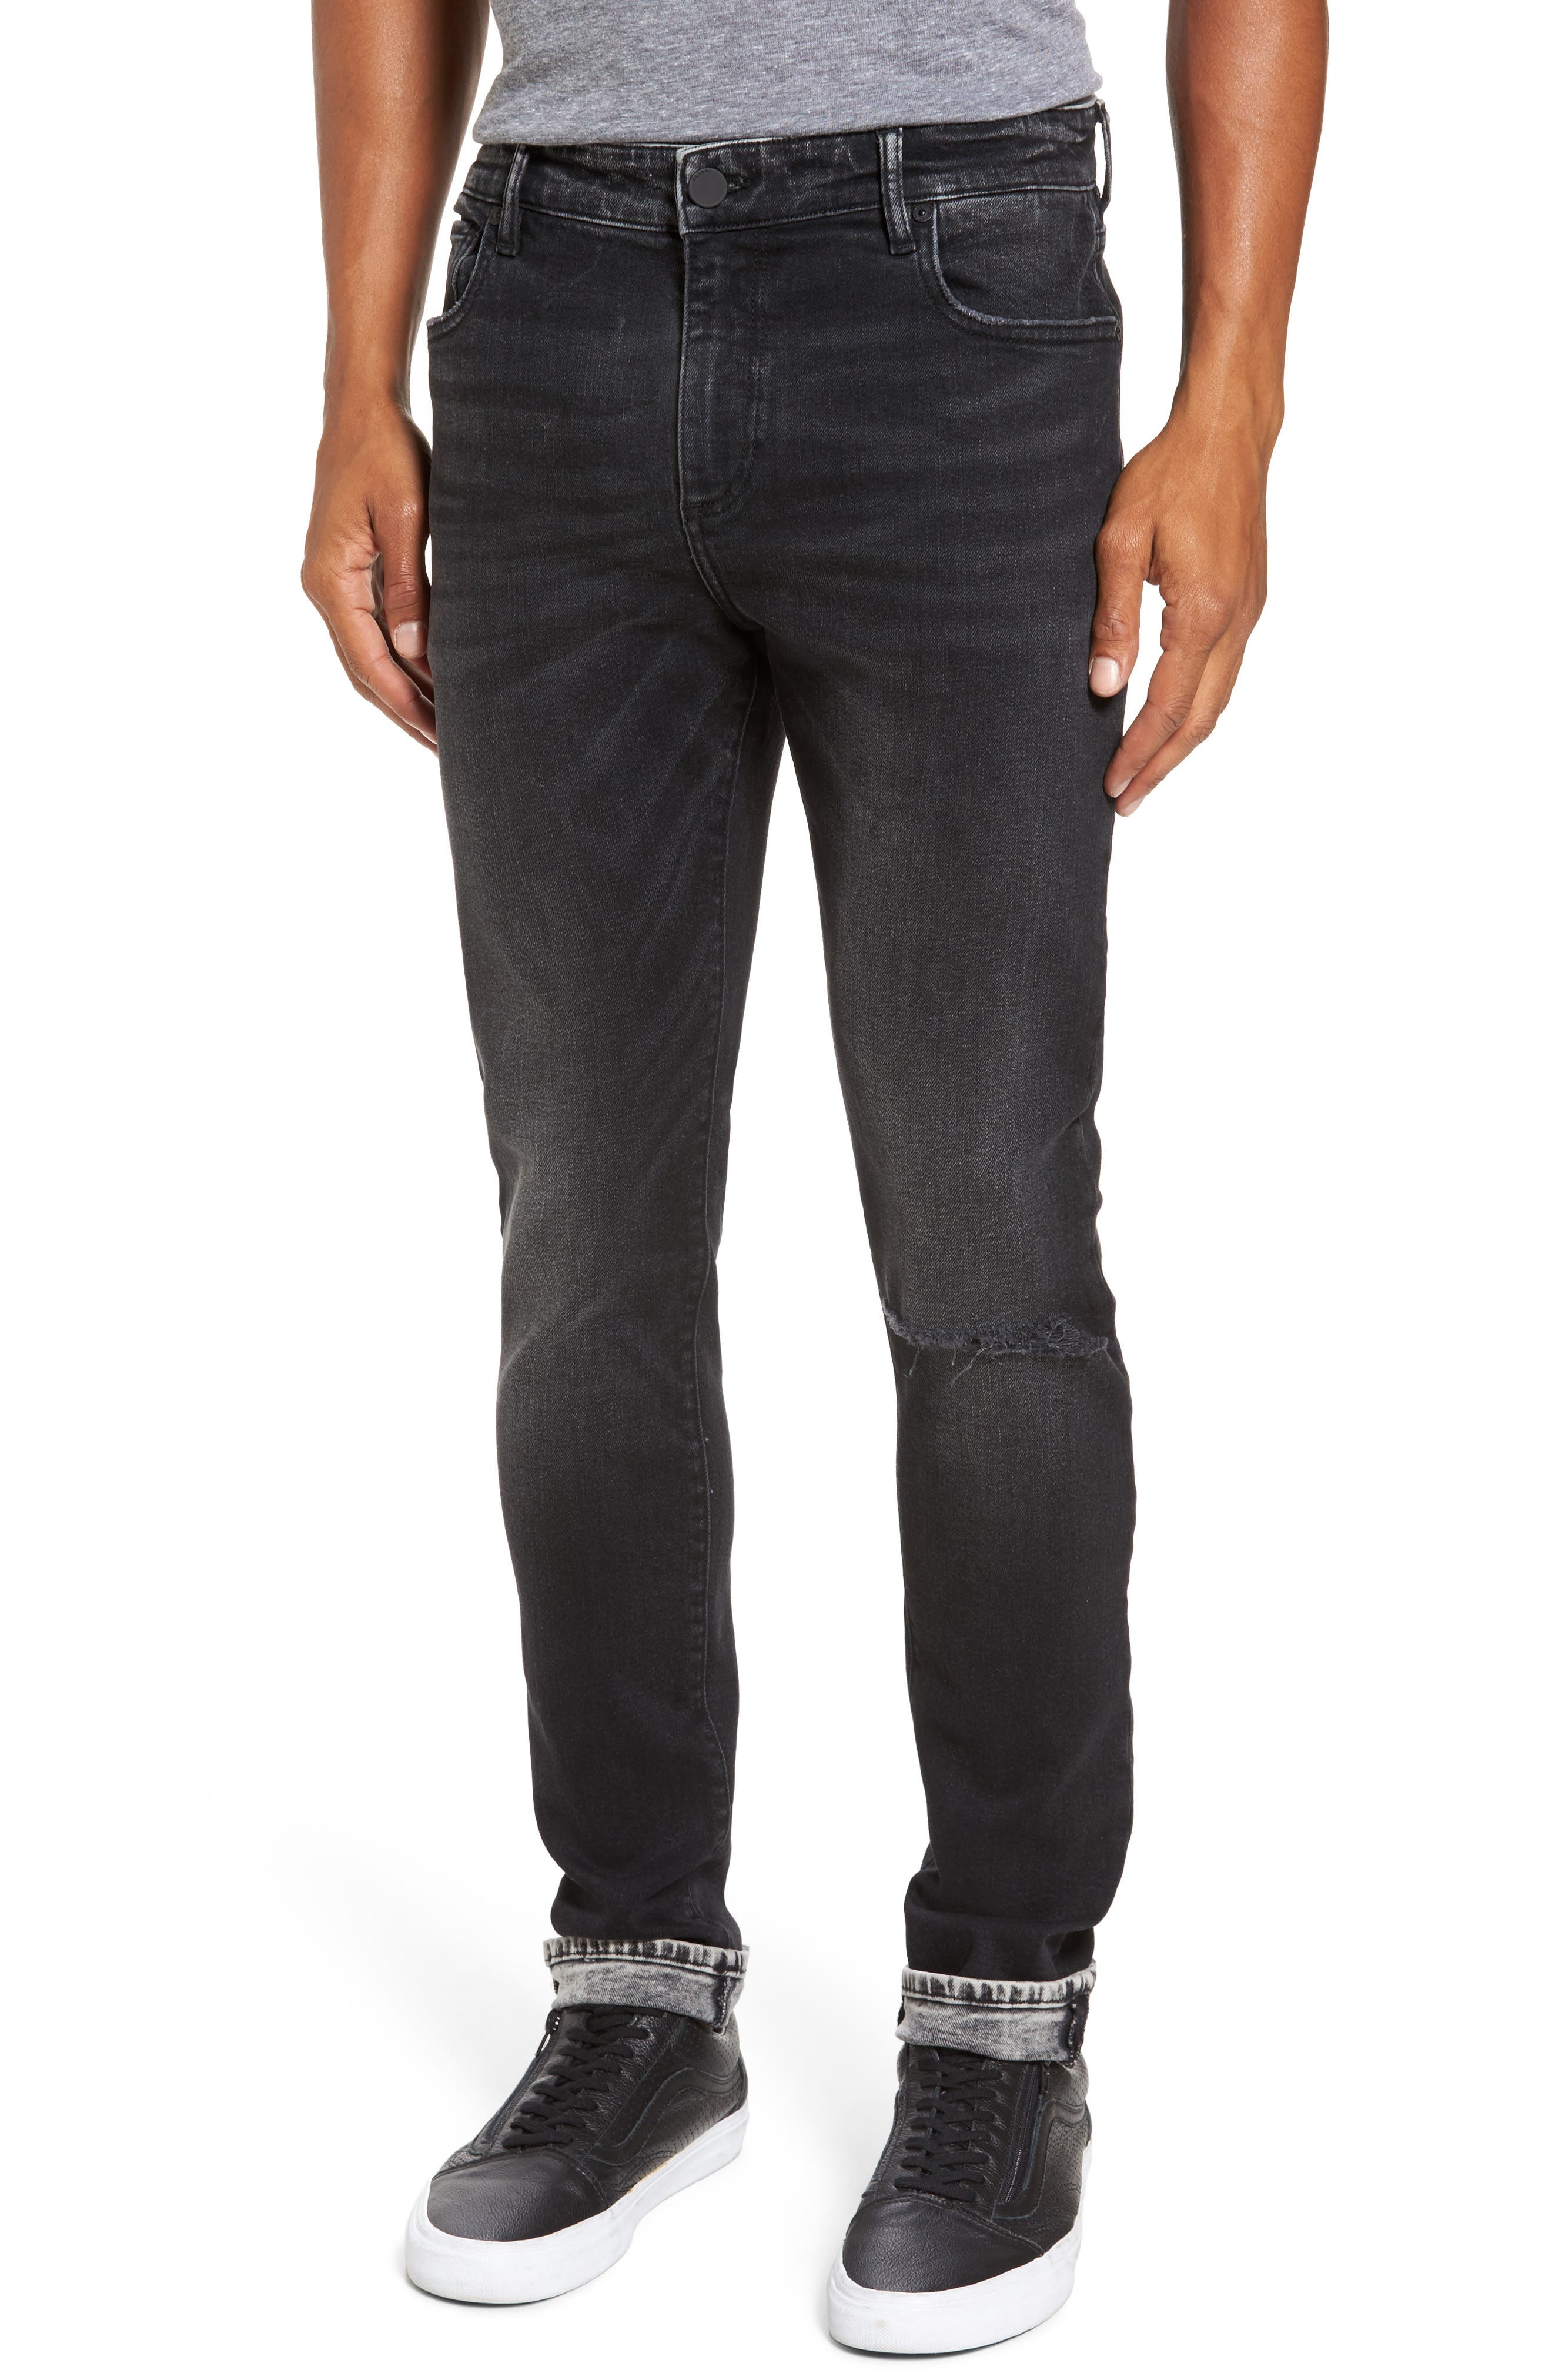 Hunter Skinny Jeans,                         Main,                         color, Argon